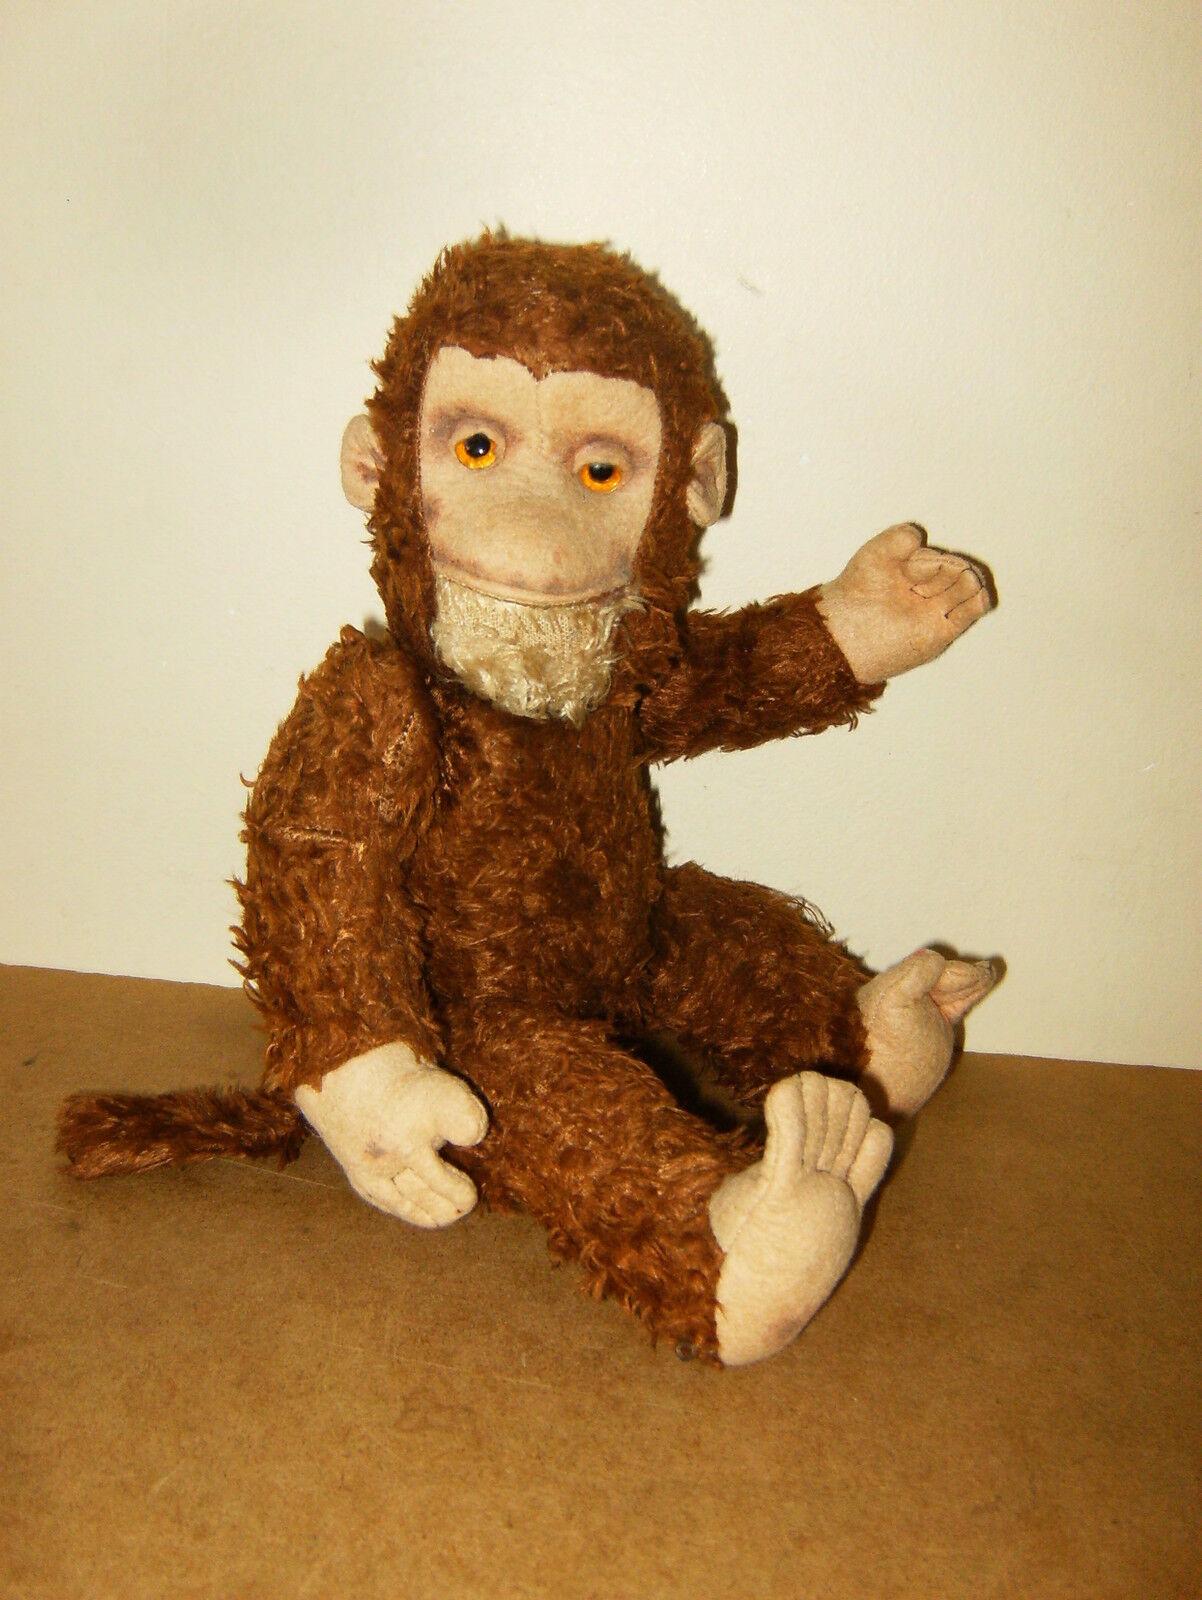 Ancienne peluche singe articulé    vintage stuffed jointed monkey - 12    31cm